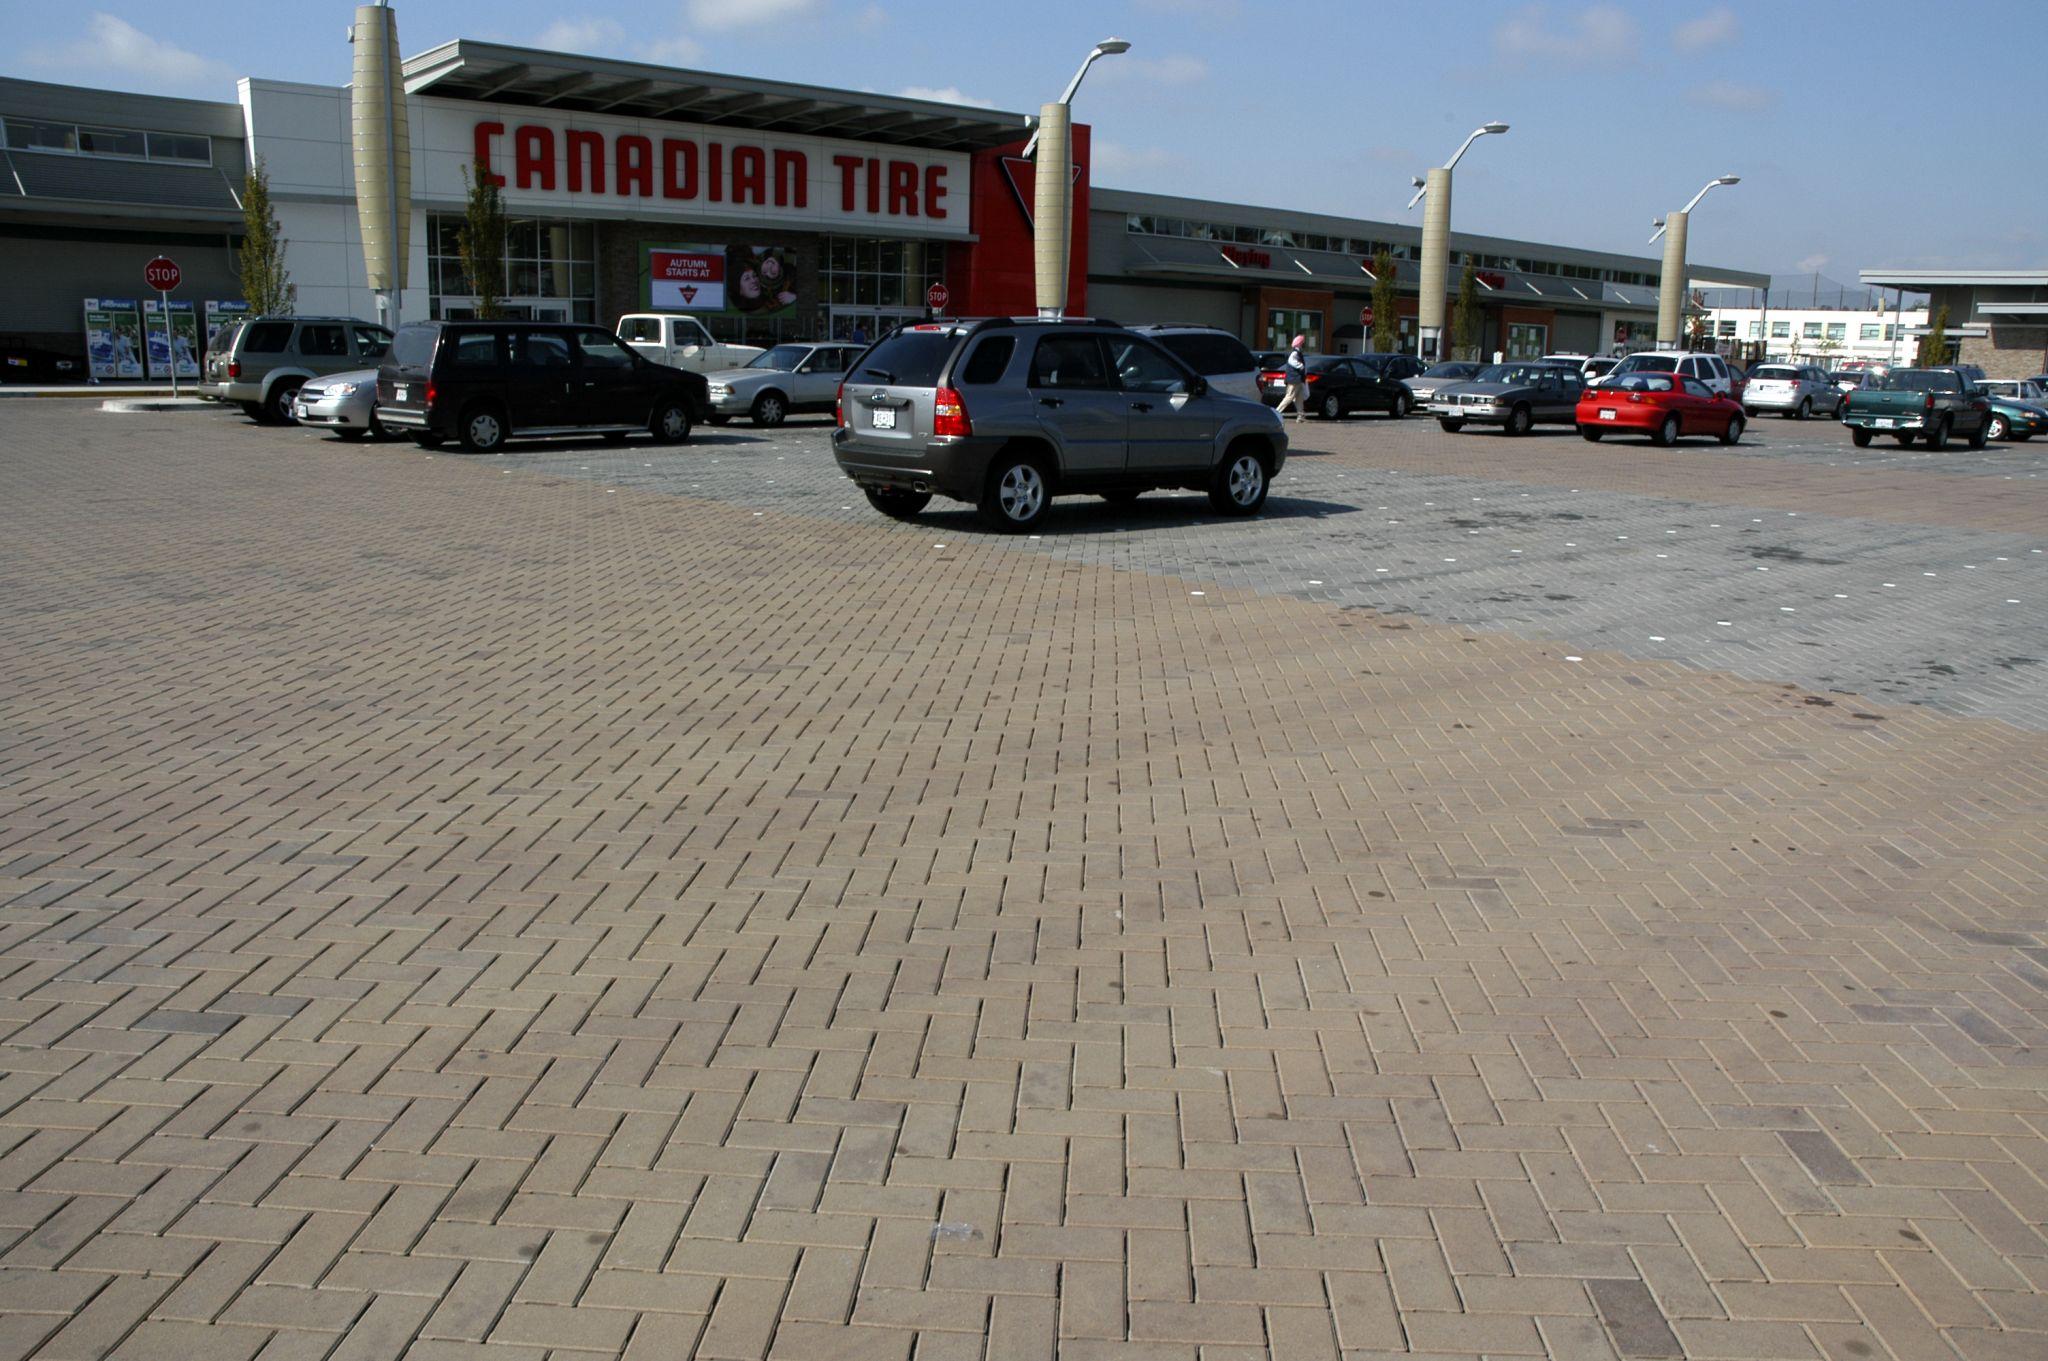 The Marine Way Market (Burnaby, B.C.) benefi ted from use of PICP. Photos courtesy ICPI